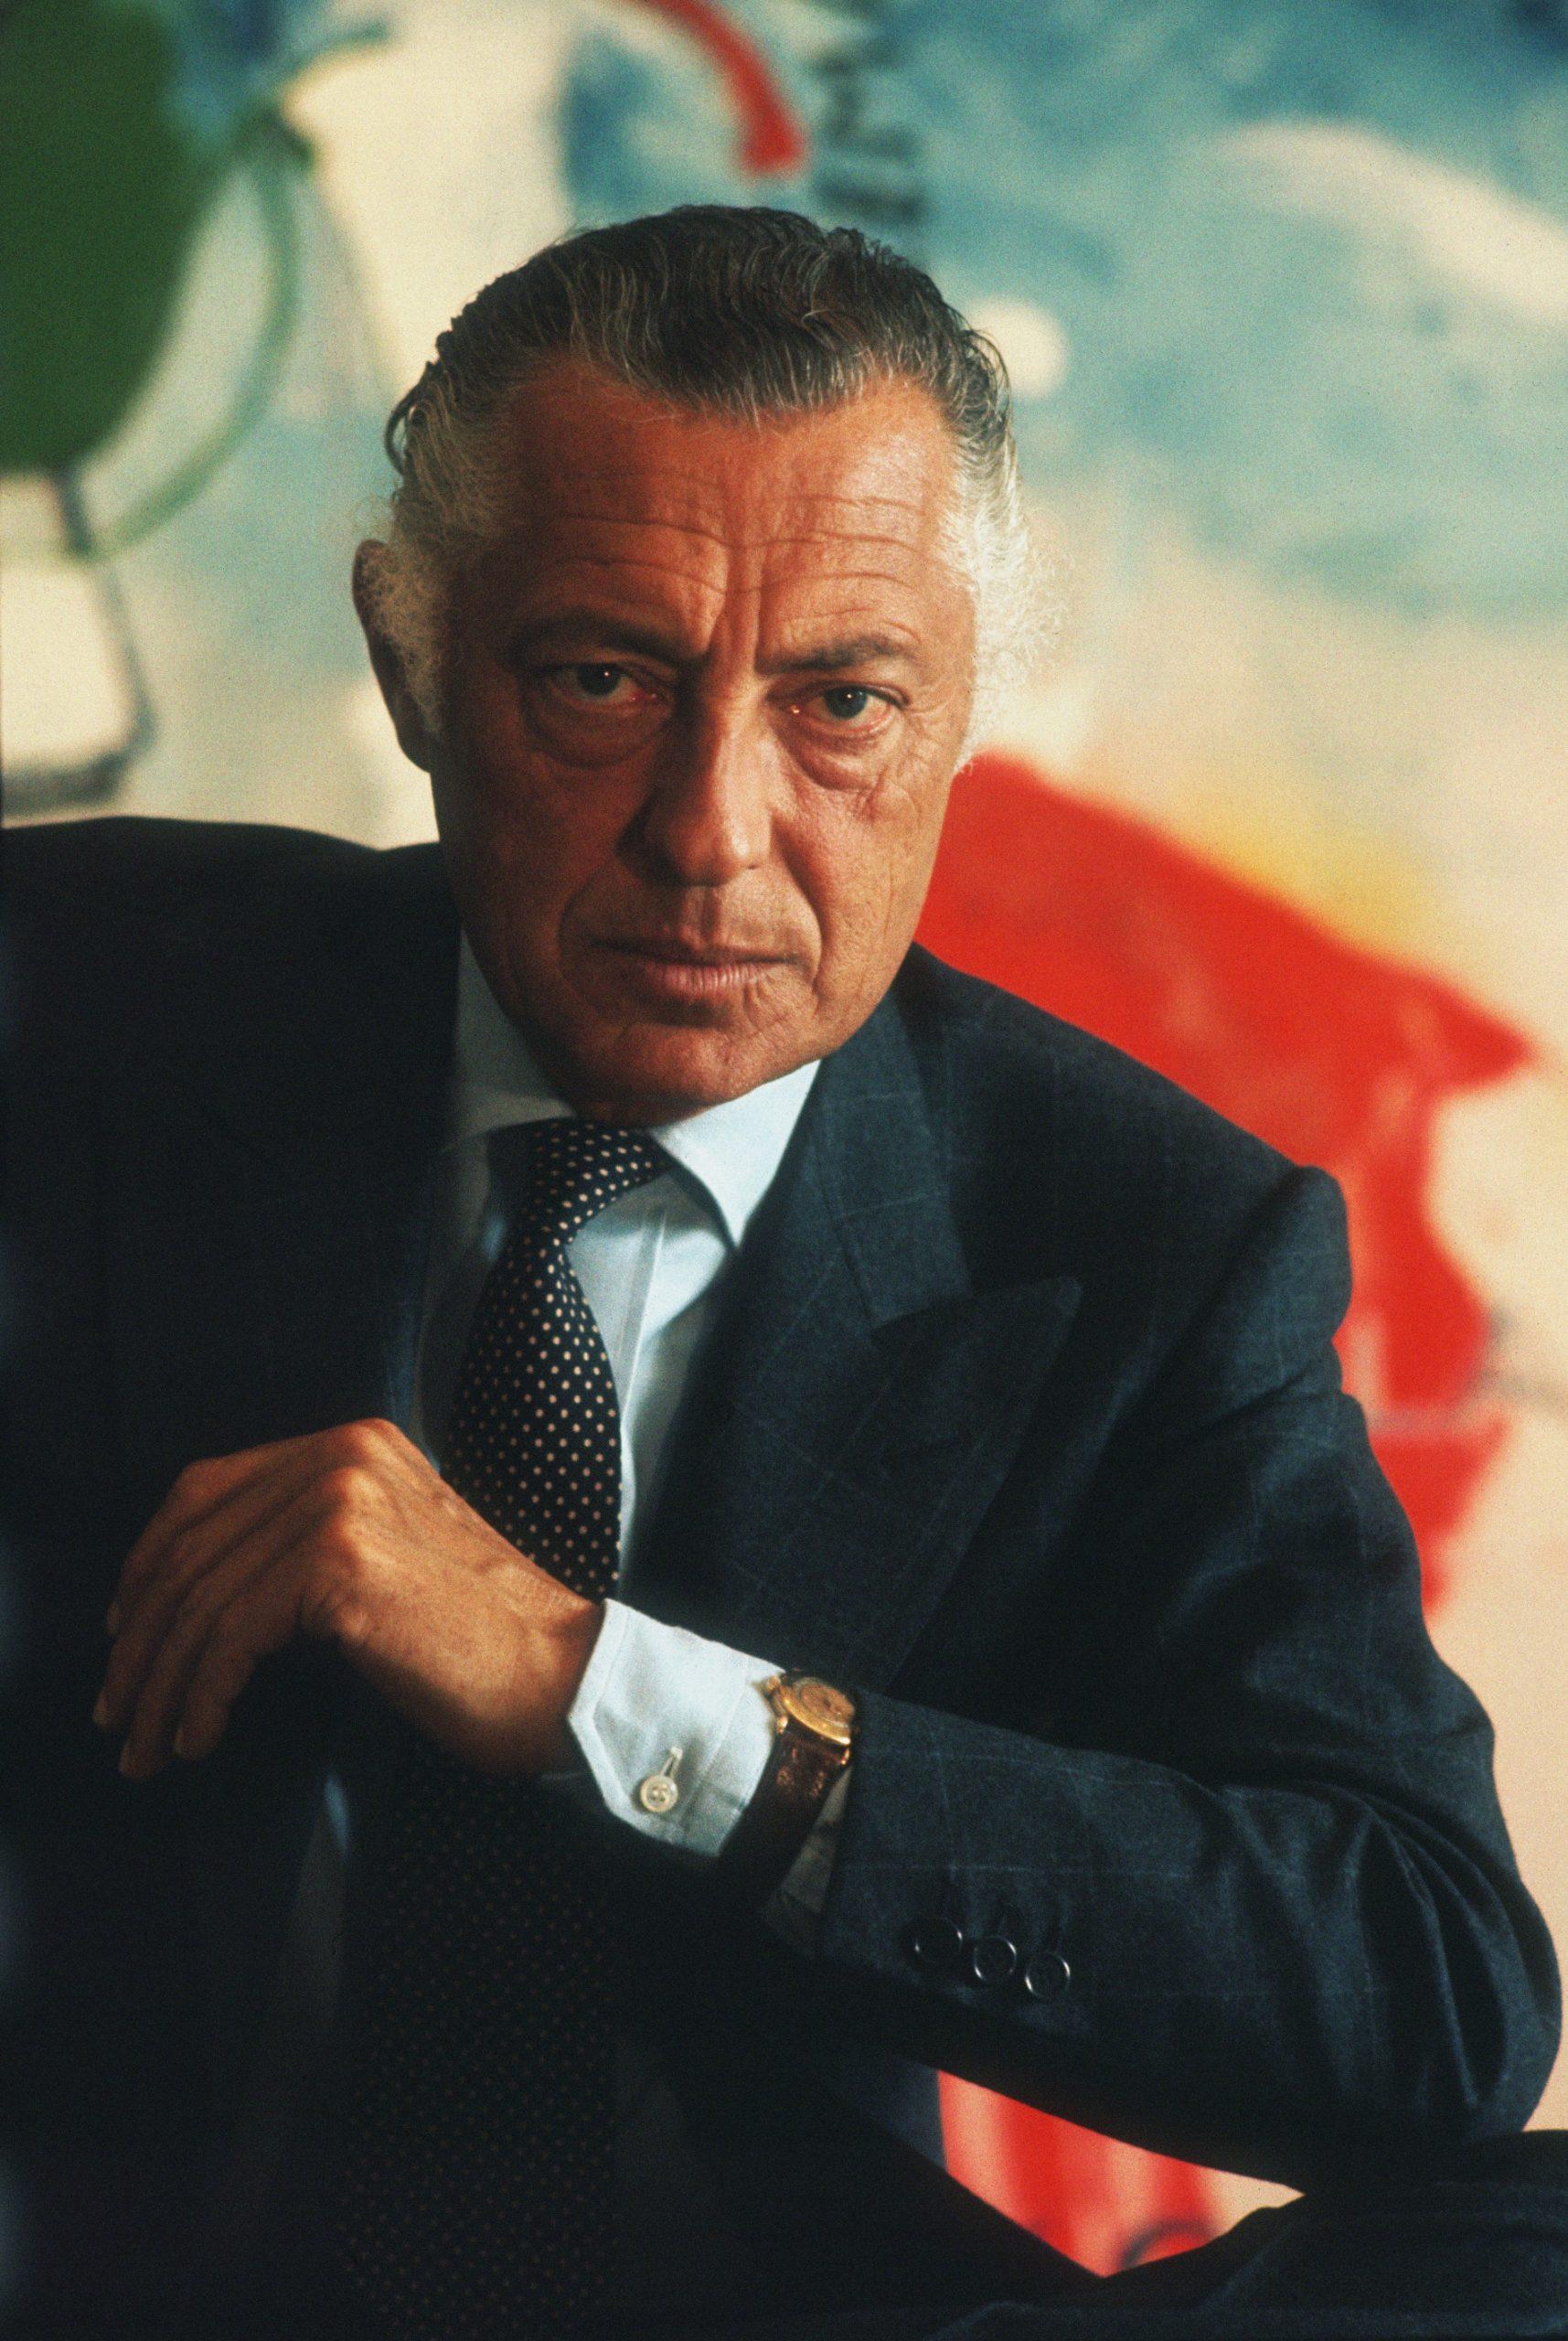 phong cách sprezzatura Gianni Agnelli